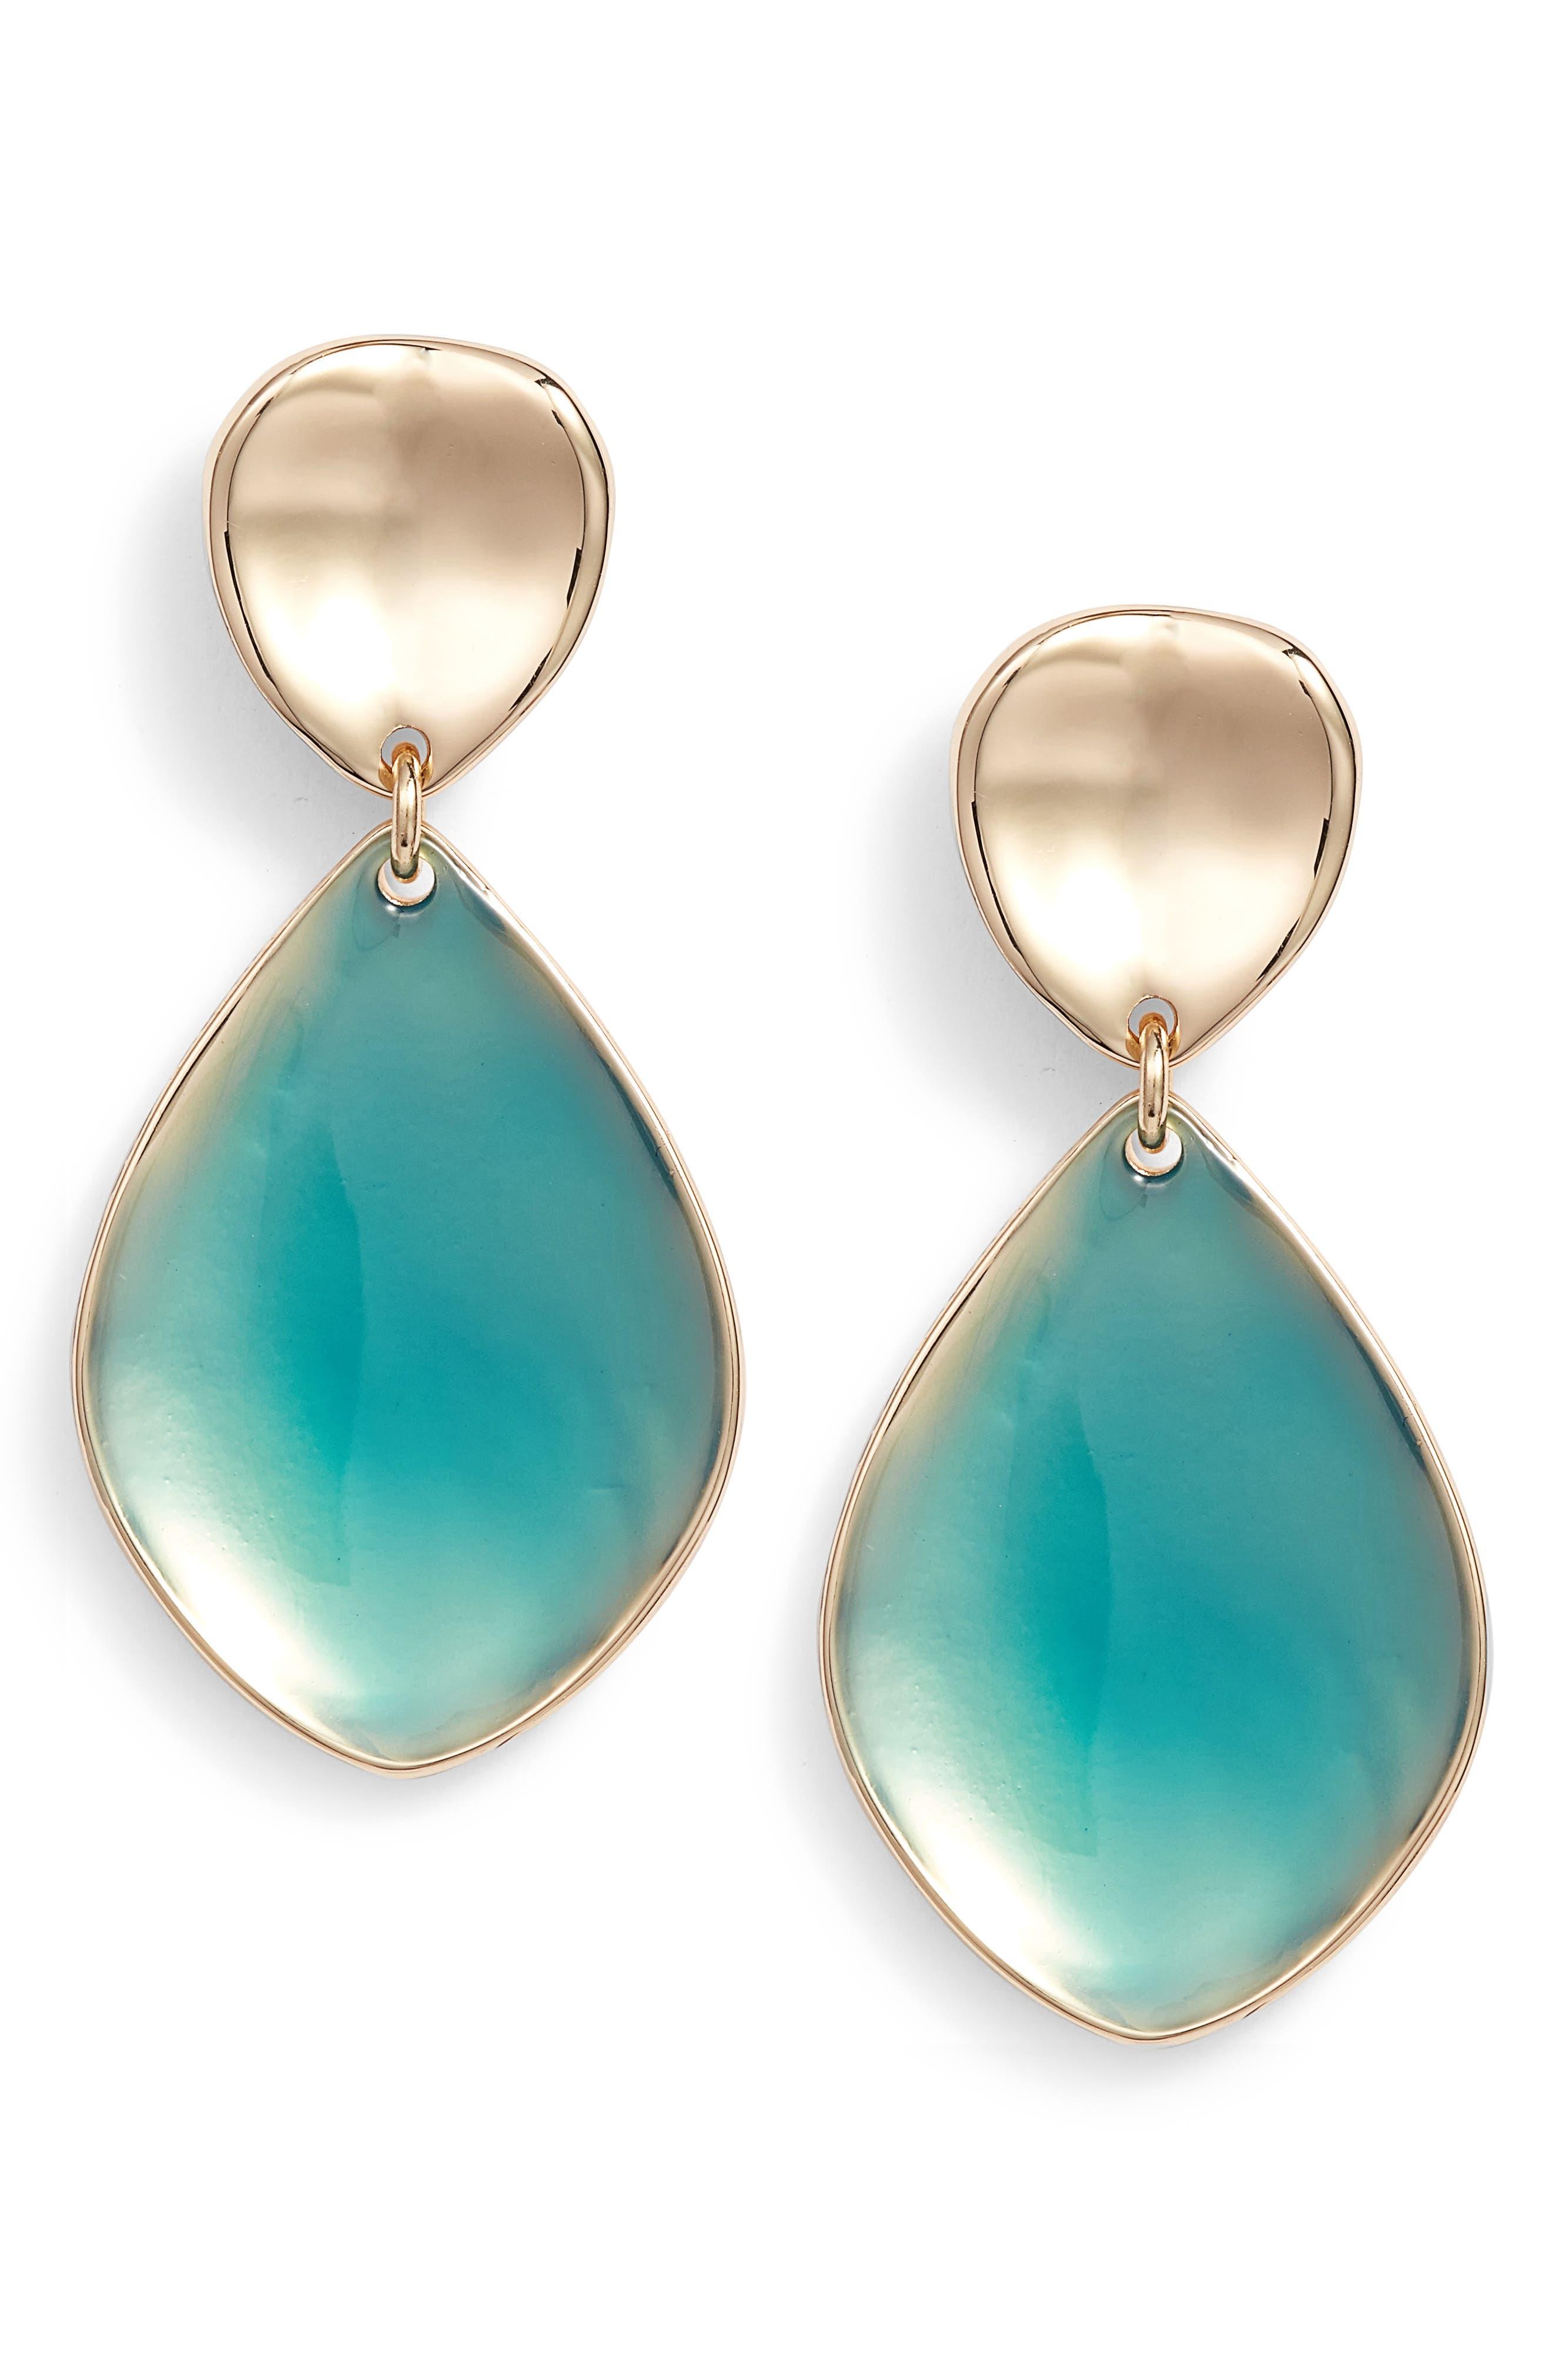 Painted Petal Double Drop Earrings,                             Main thumbnail 1, color,                             Teal- Gold